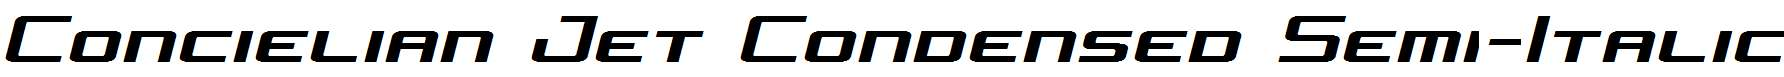 Concielian-Jet-Condensed-Semi-Italic